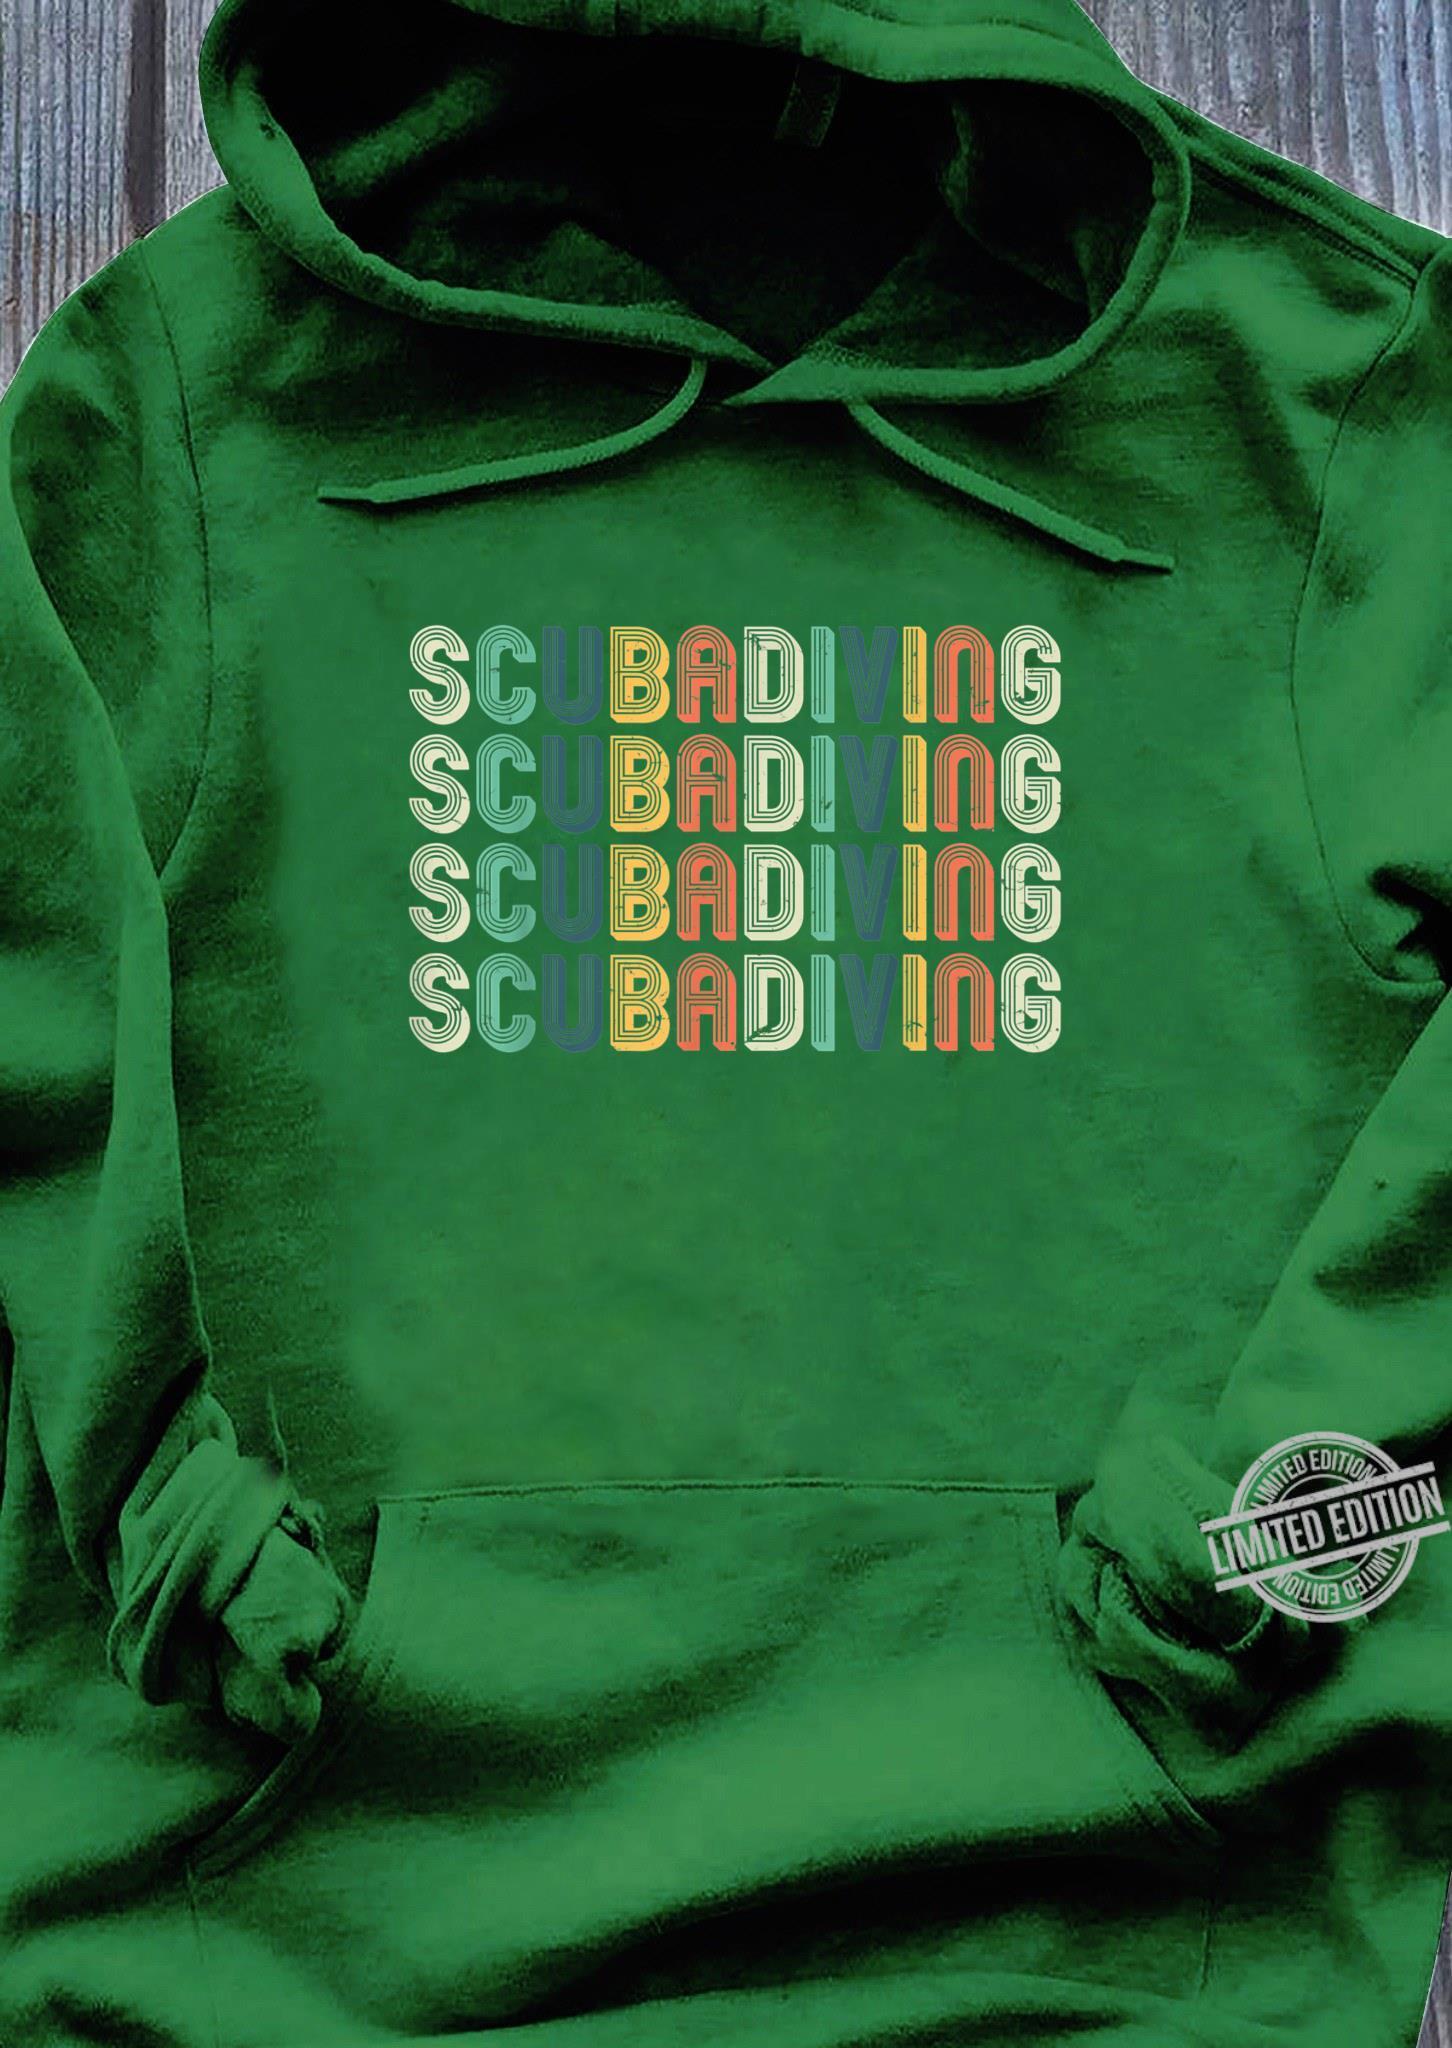 Taucher Shirt Herren Tauchen Taucherin Geschenk Scubadiving Shirt hoodie